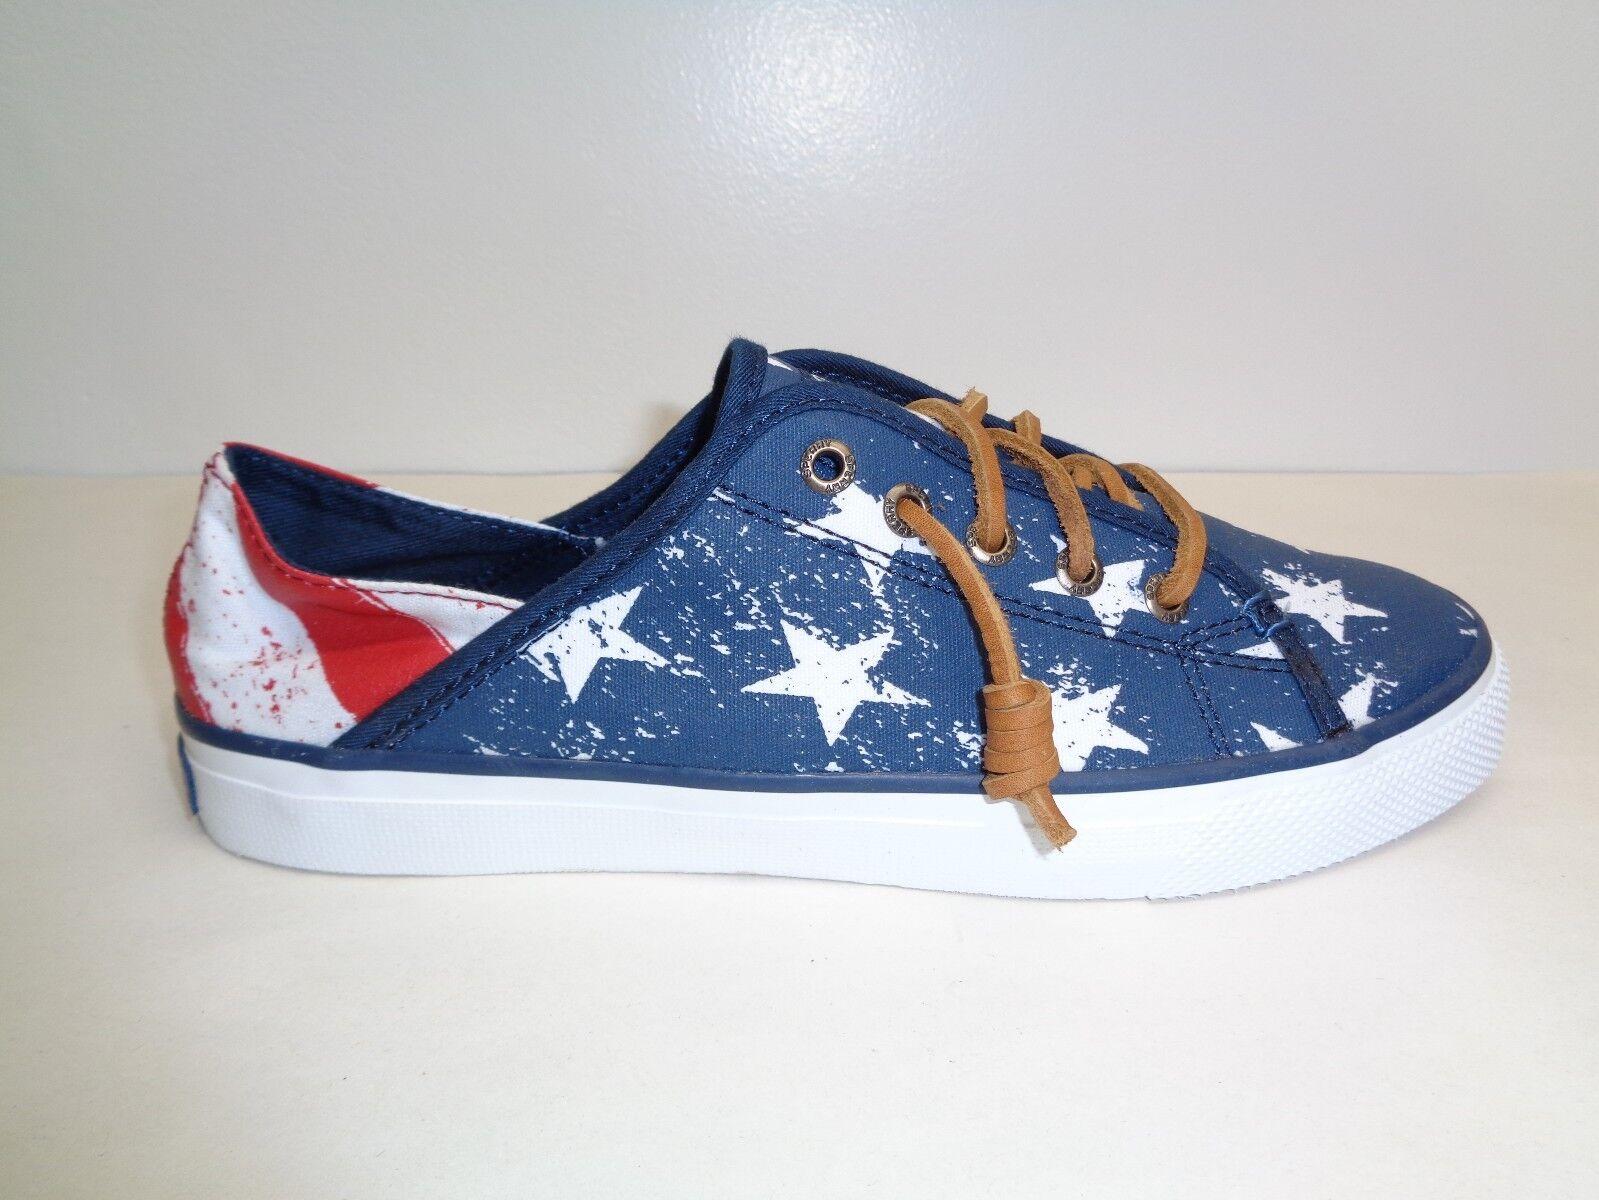 Sperry Sze 9.5 SEACOAST ISLE STARS AND STRIPES Fashion Sneakers NEU Damenschuhe Schuhes